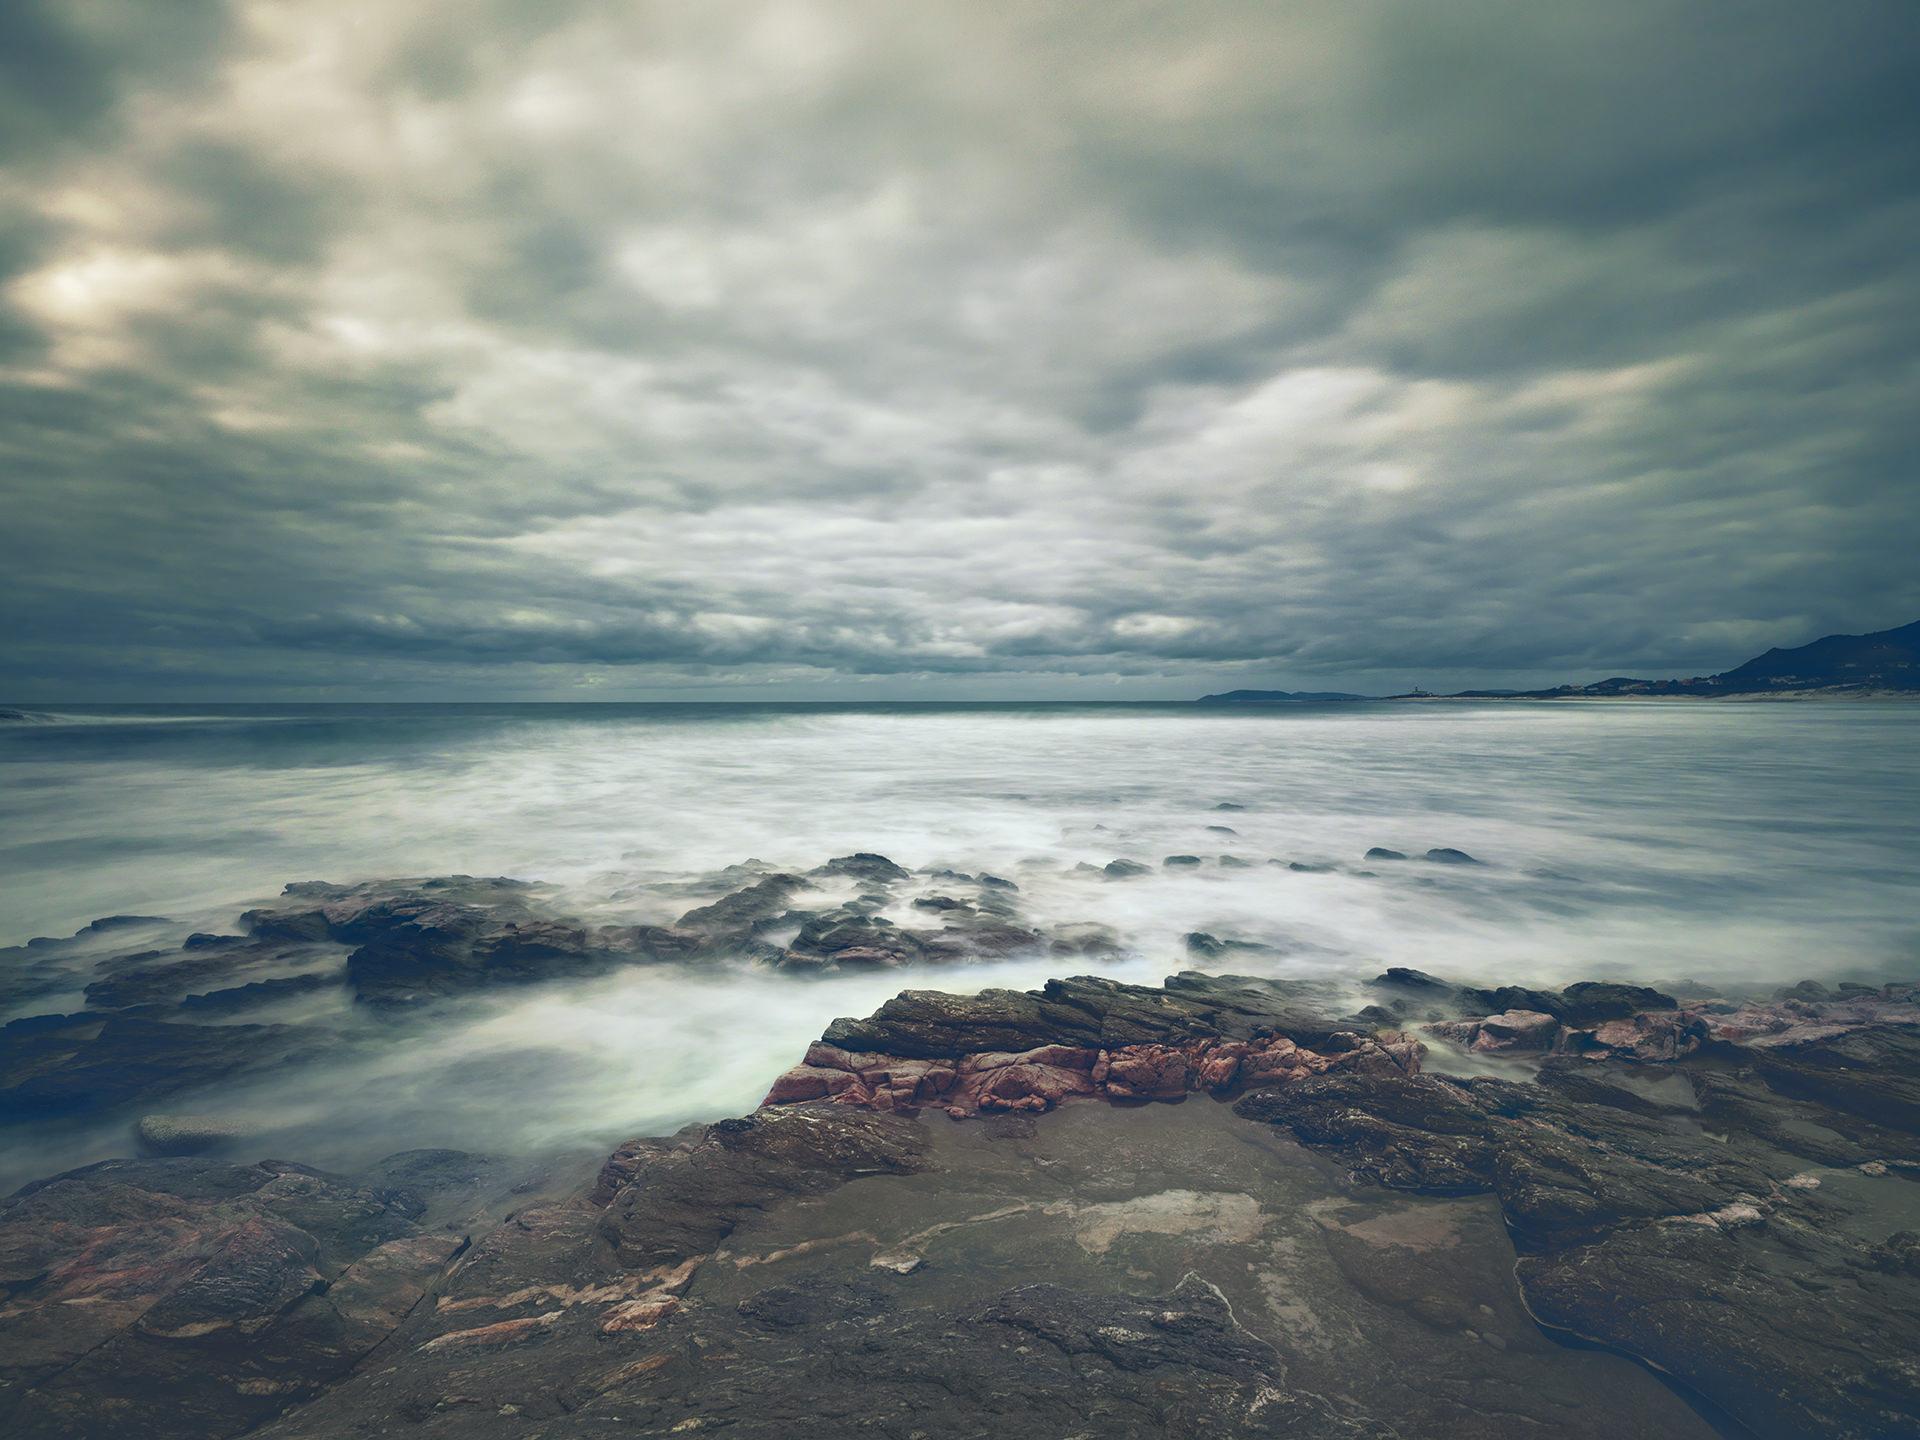 ©ankeluckmann1717, sea, coast, galicia, green, landscape, rocks, spain, anke luckmann, www.ankeluckmann.com